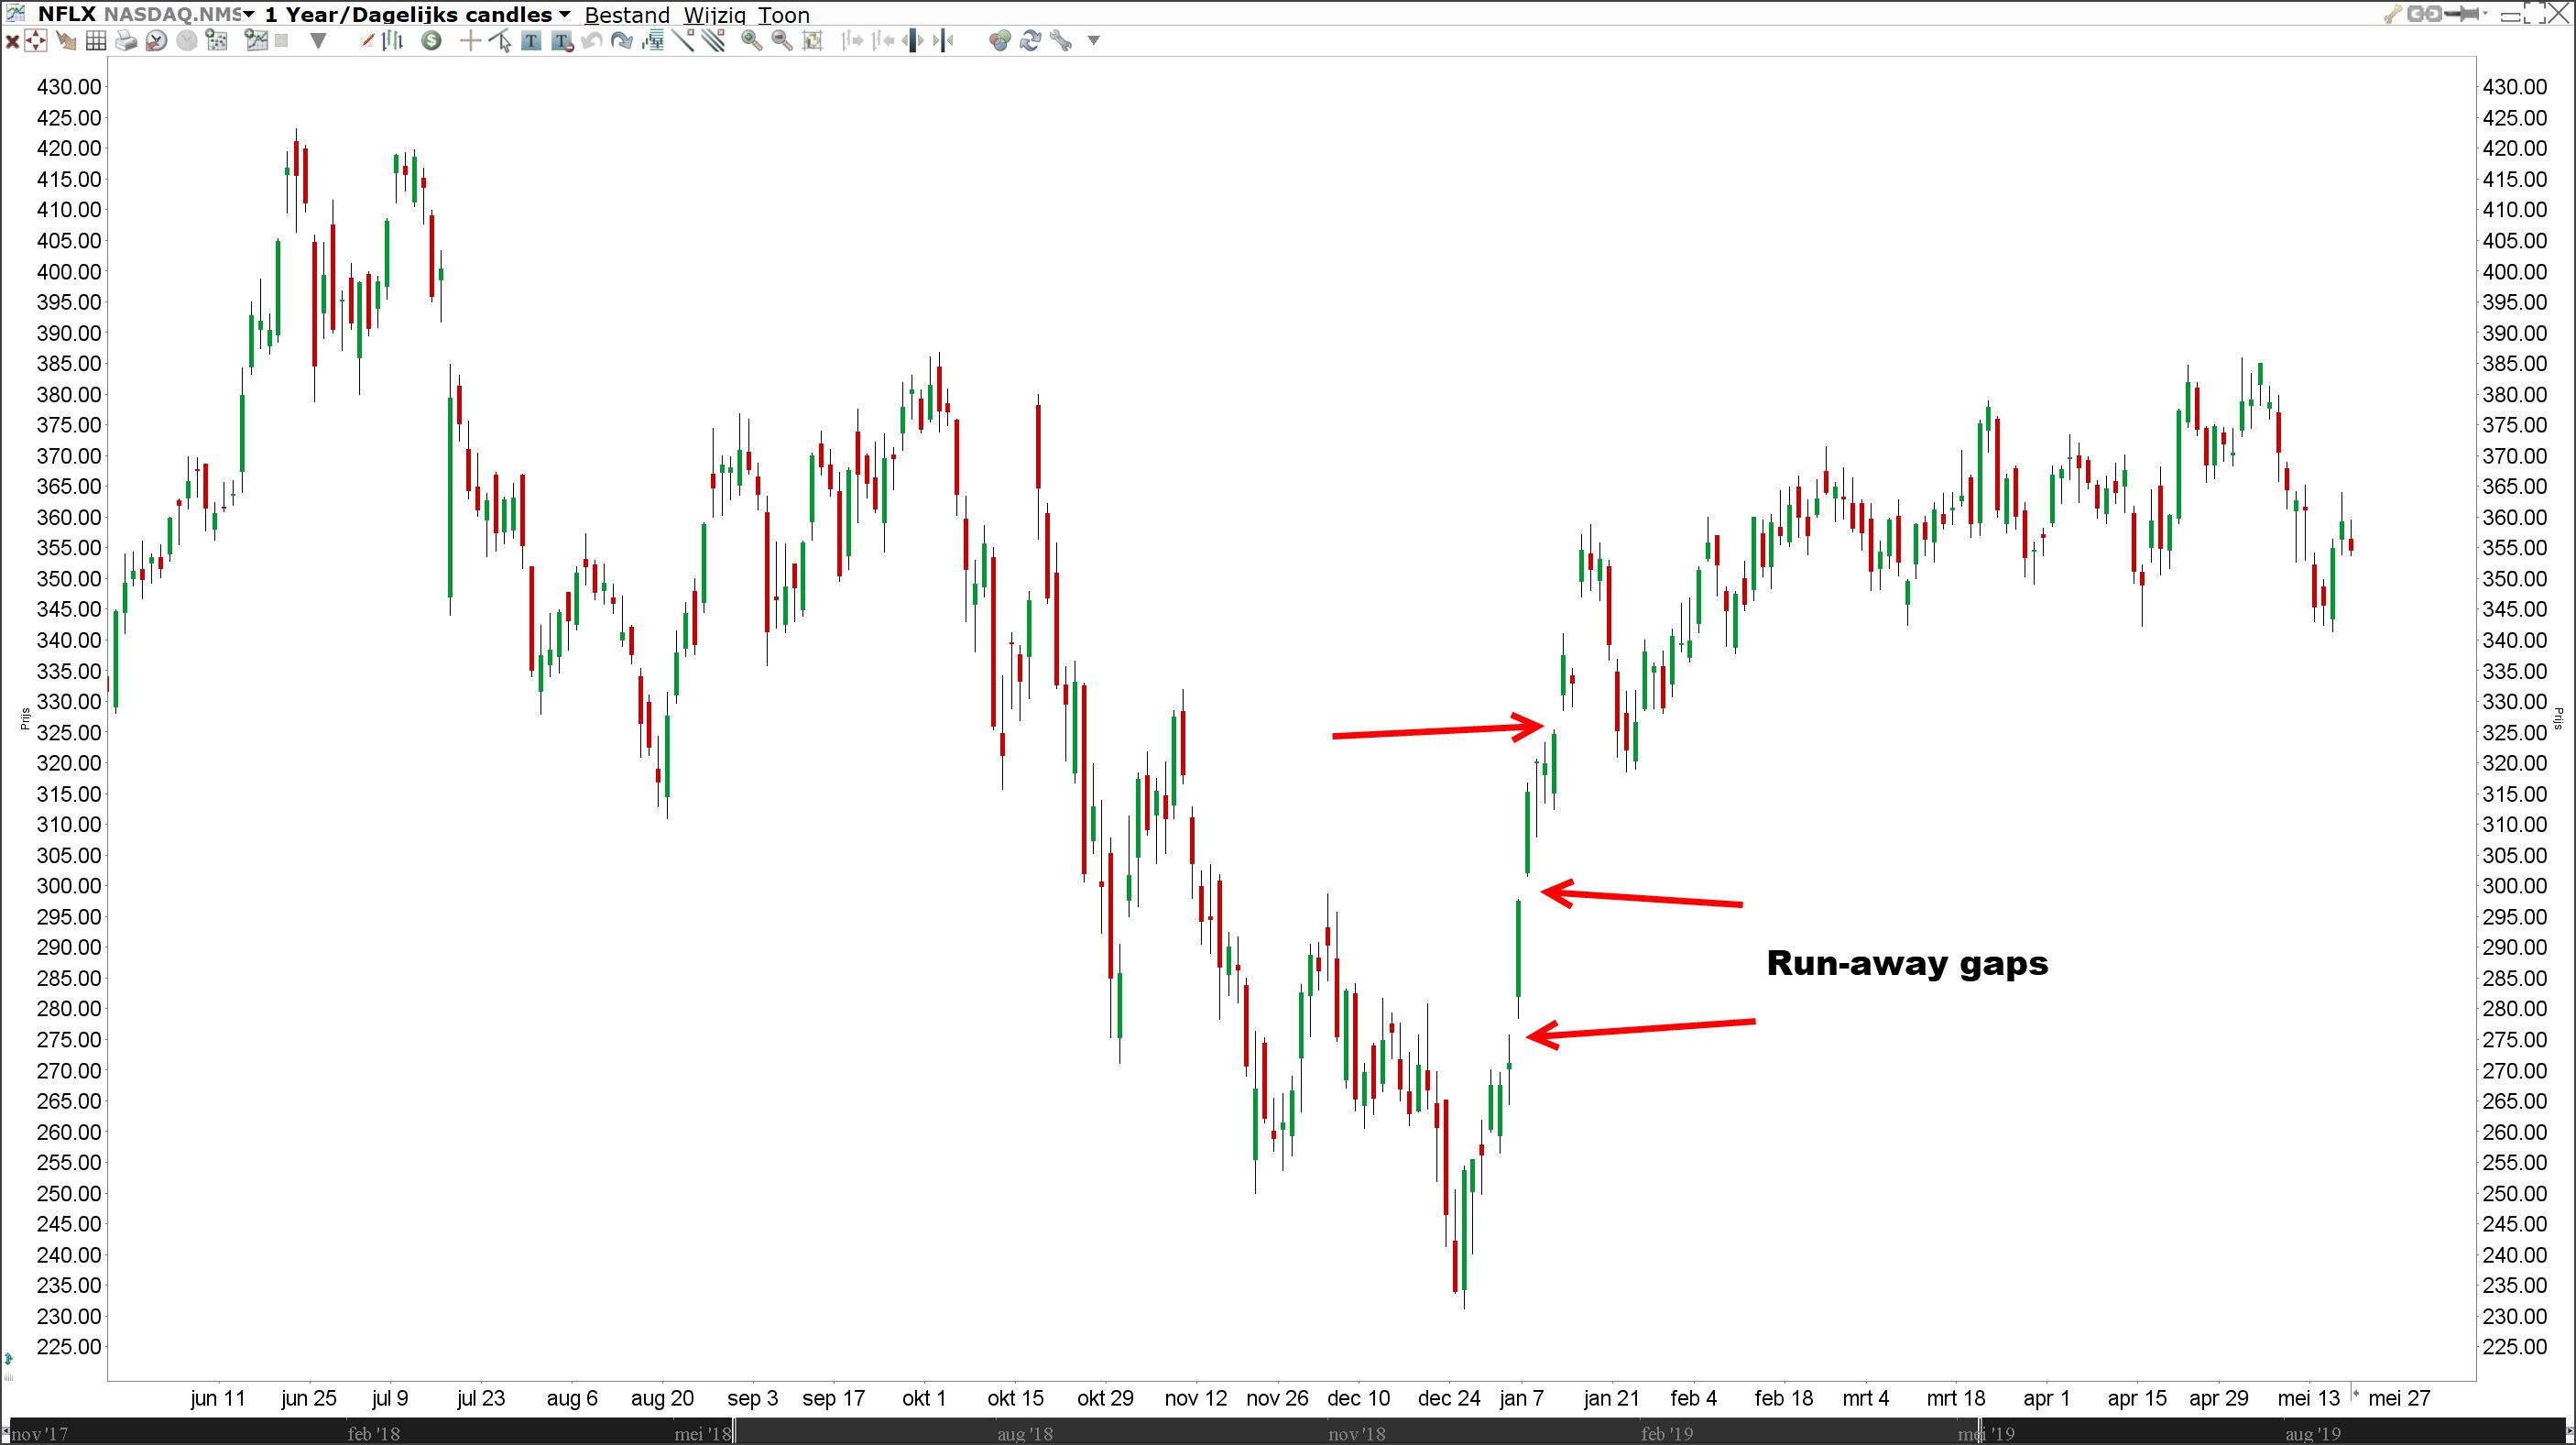 Run-away gaps | gap trading